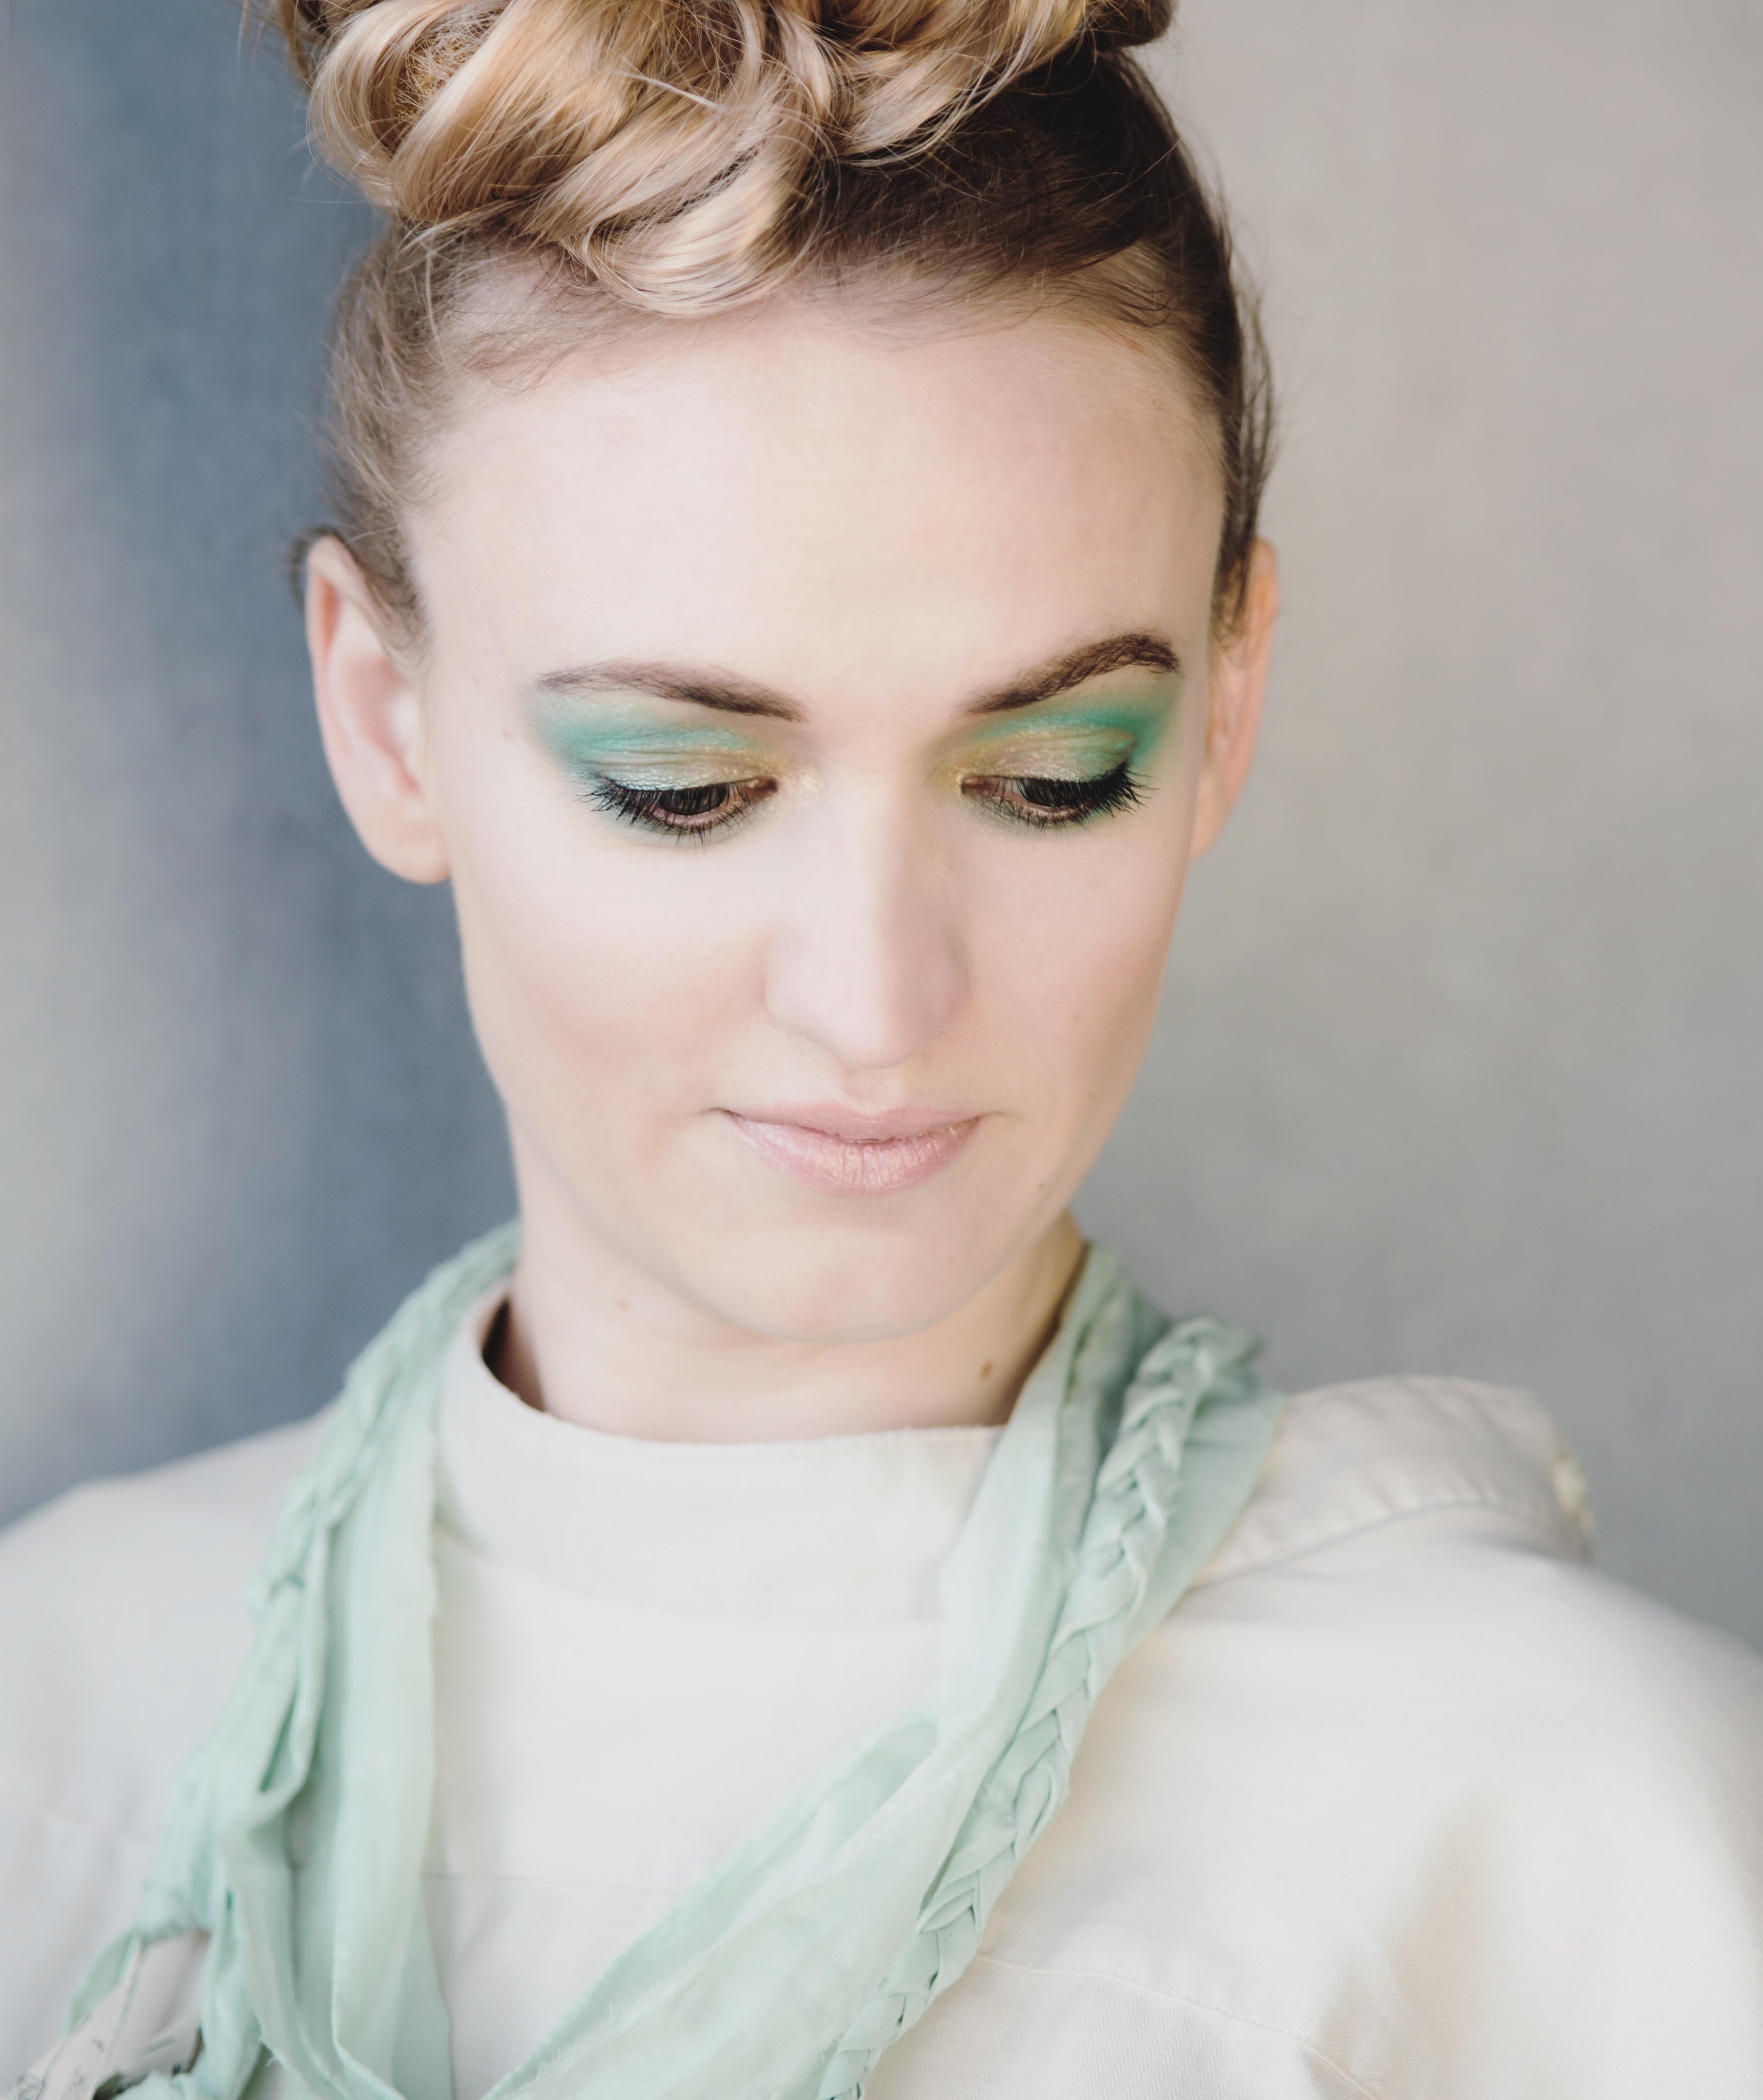 Veronika Emily Pohl